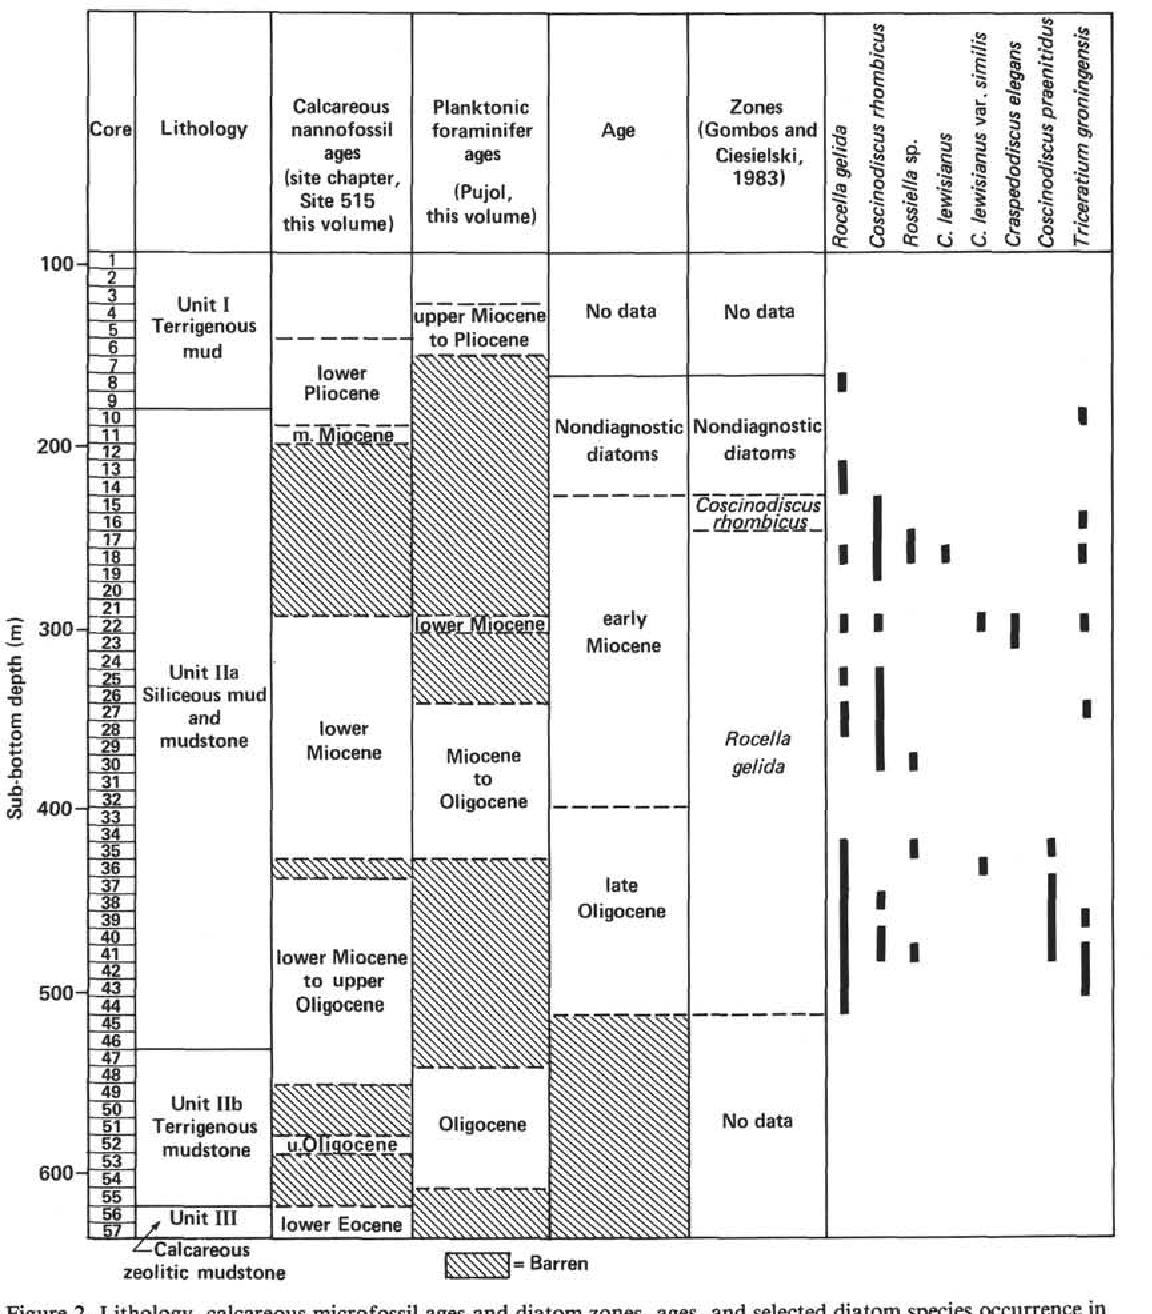 PDF] SURVEY OF DIATOMS IN THE UPPER OLIGOCENE AND LOWER